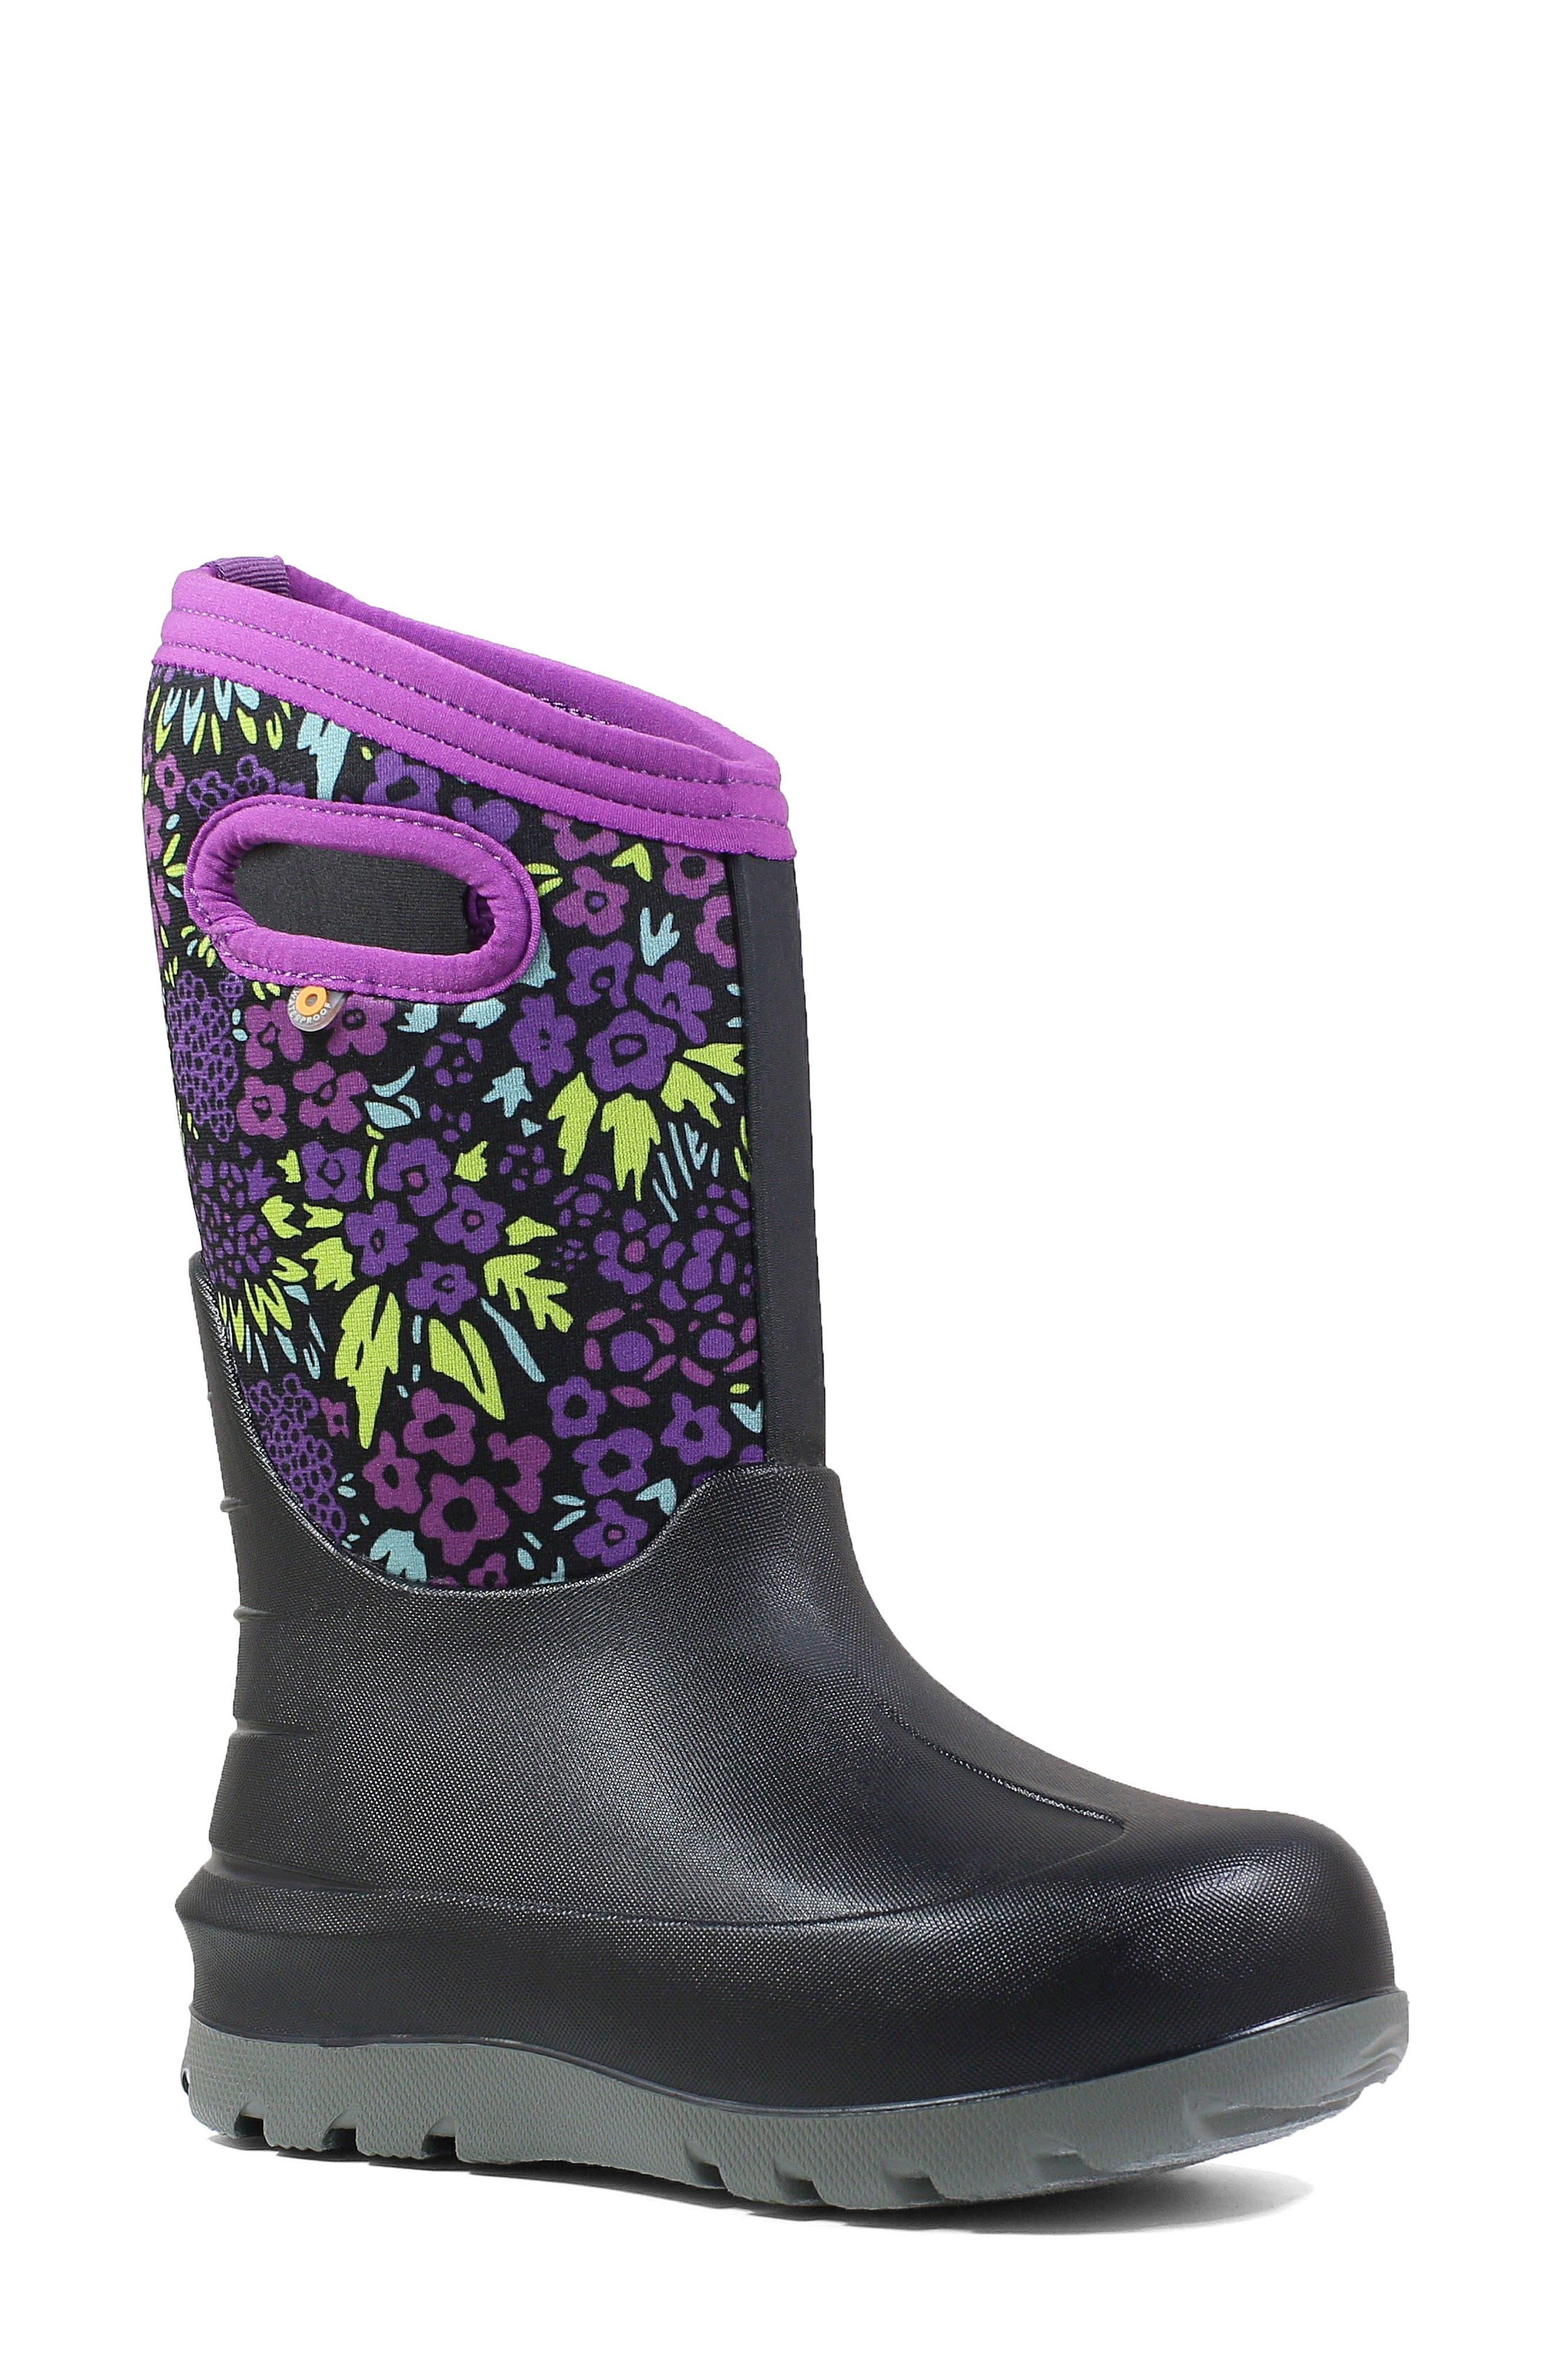 Image of Bogs Neo Classic Northwest Garden Insulated Waterproof Boots